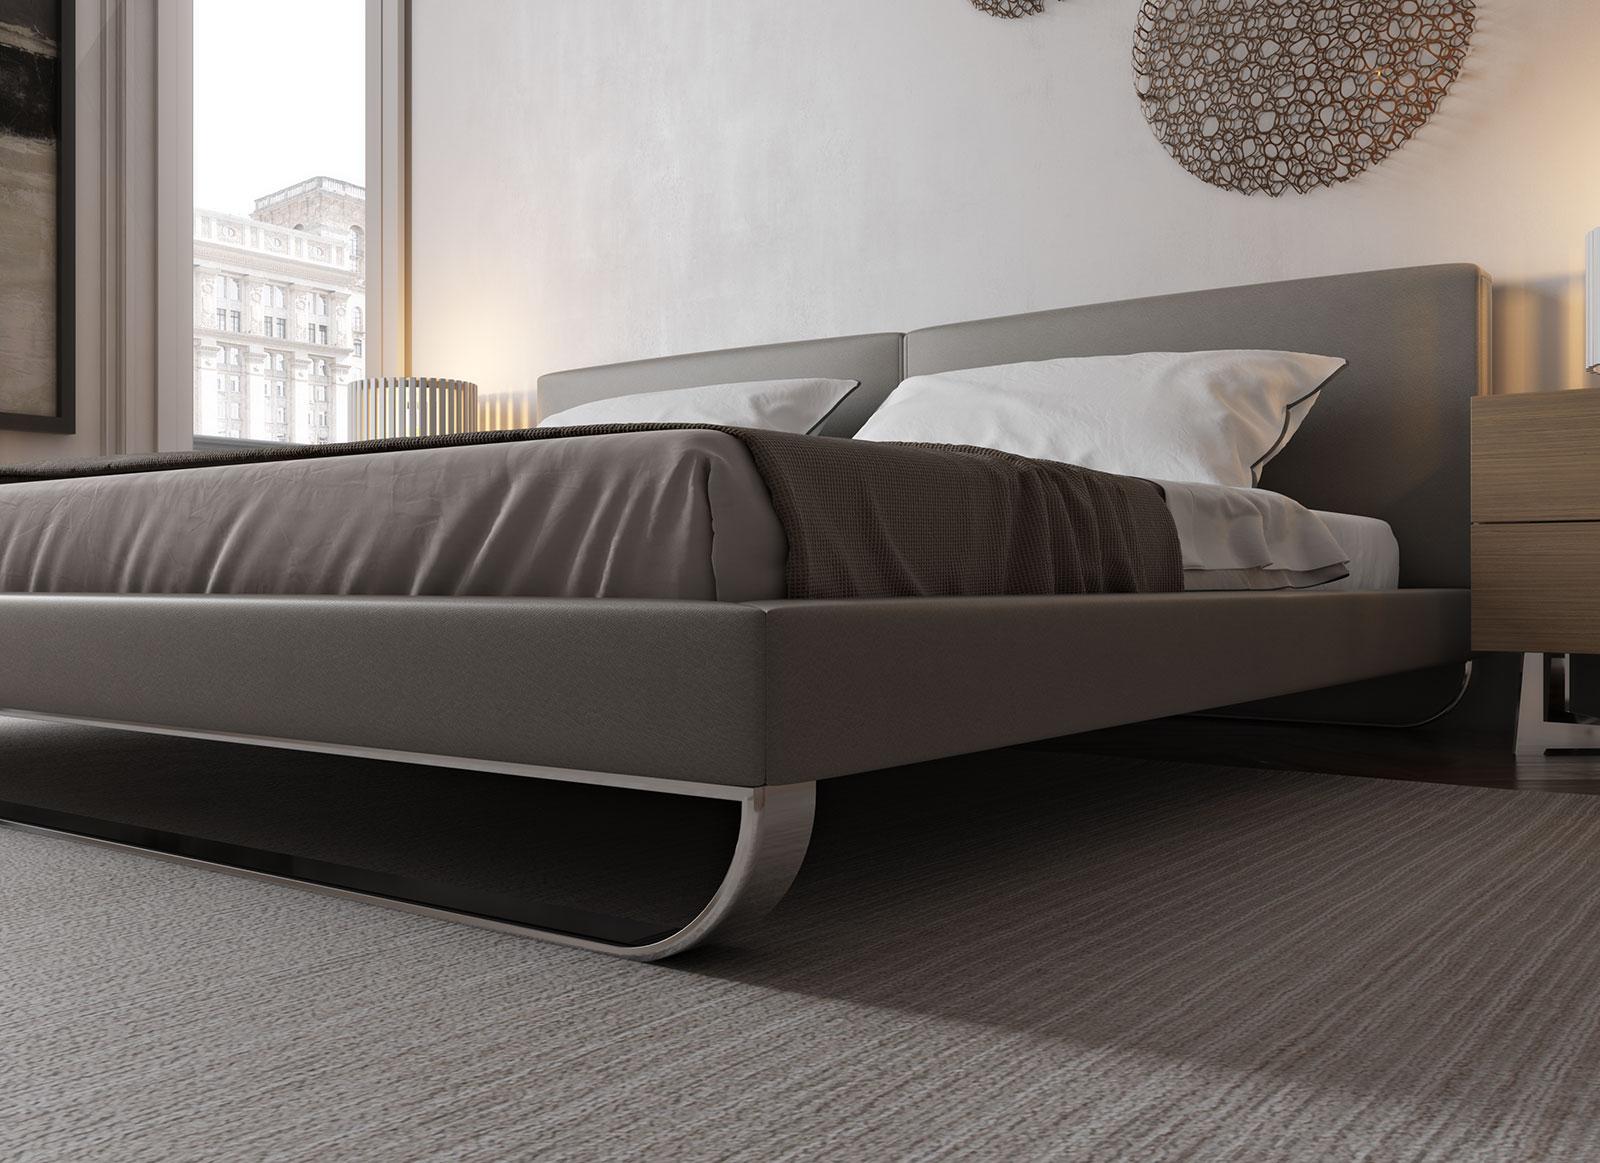 Overnice Leather Luxury Platform Bed Albuquerque New Mexico Mlchel